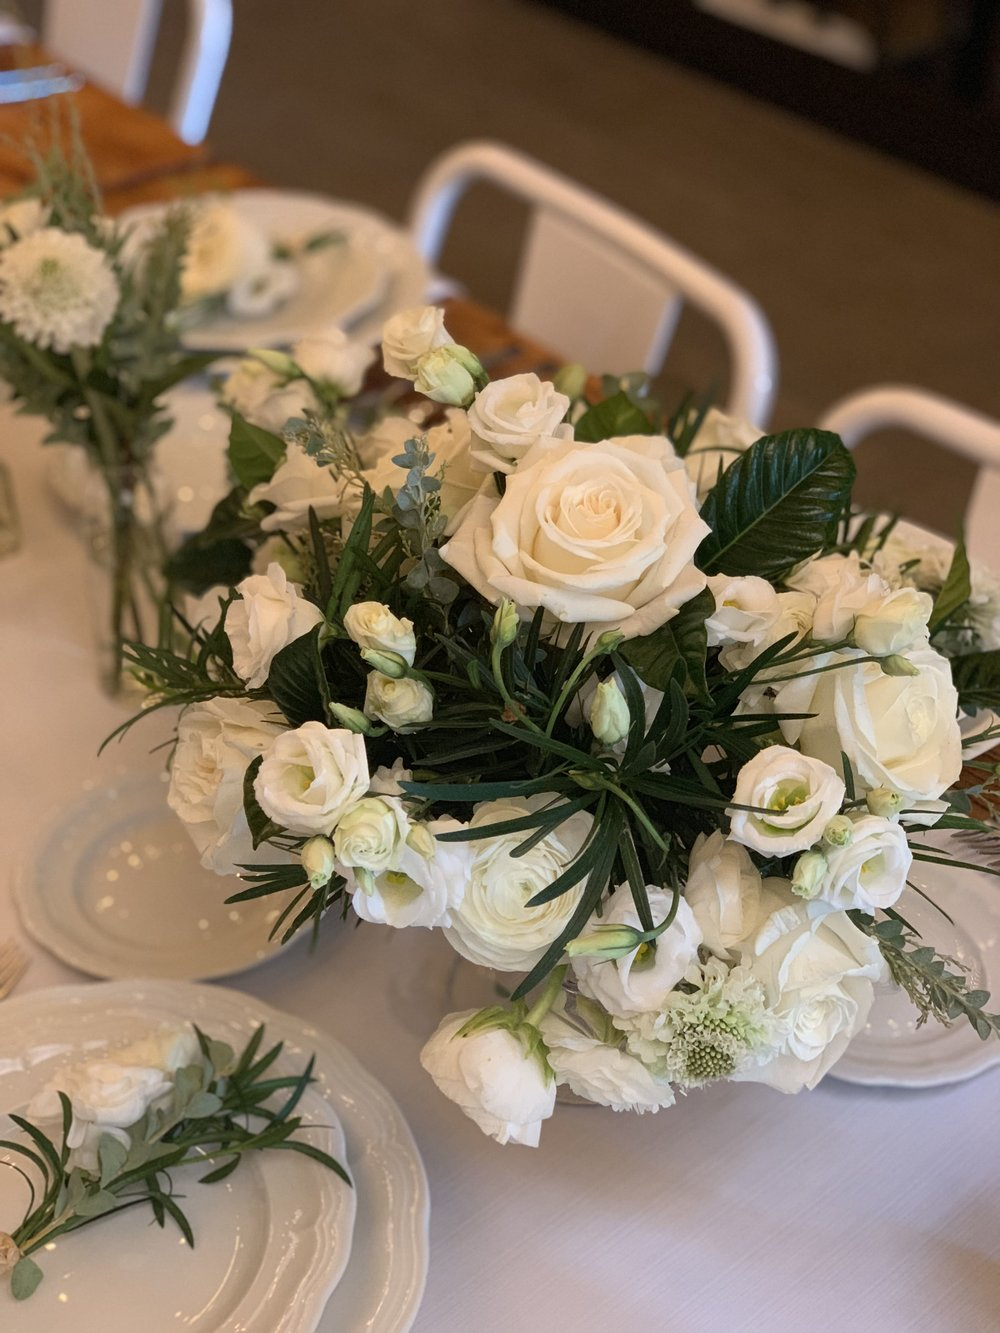 White & Green Arrangements For bareMinerals- B Floral